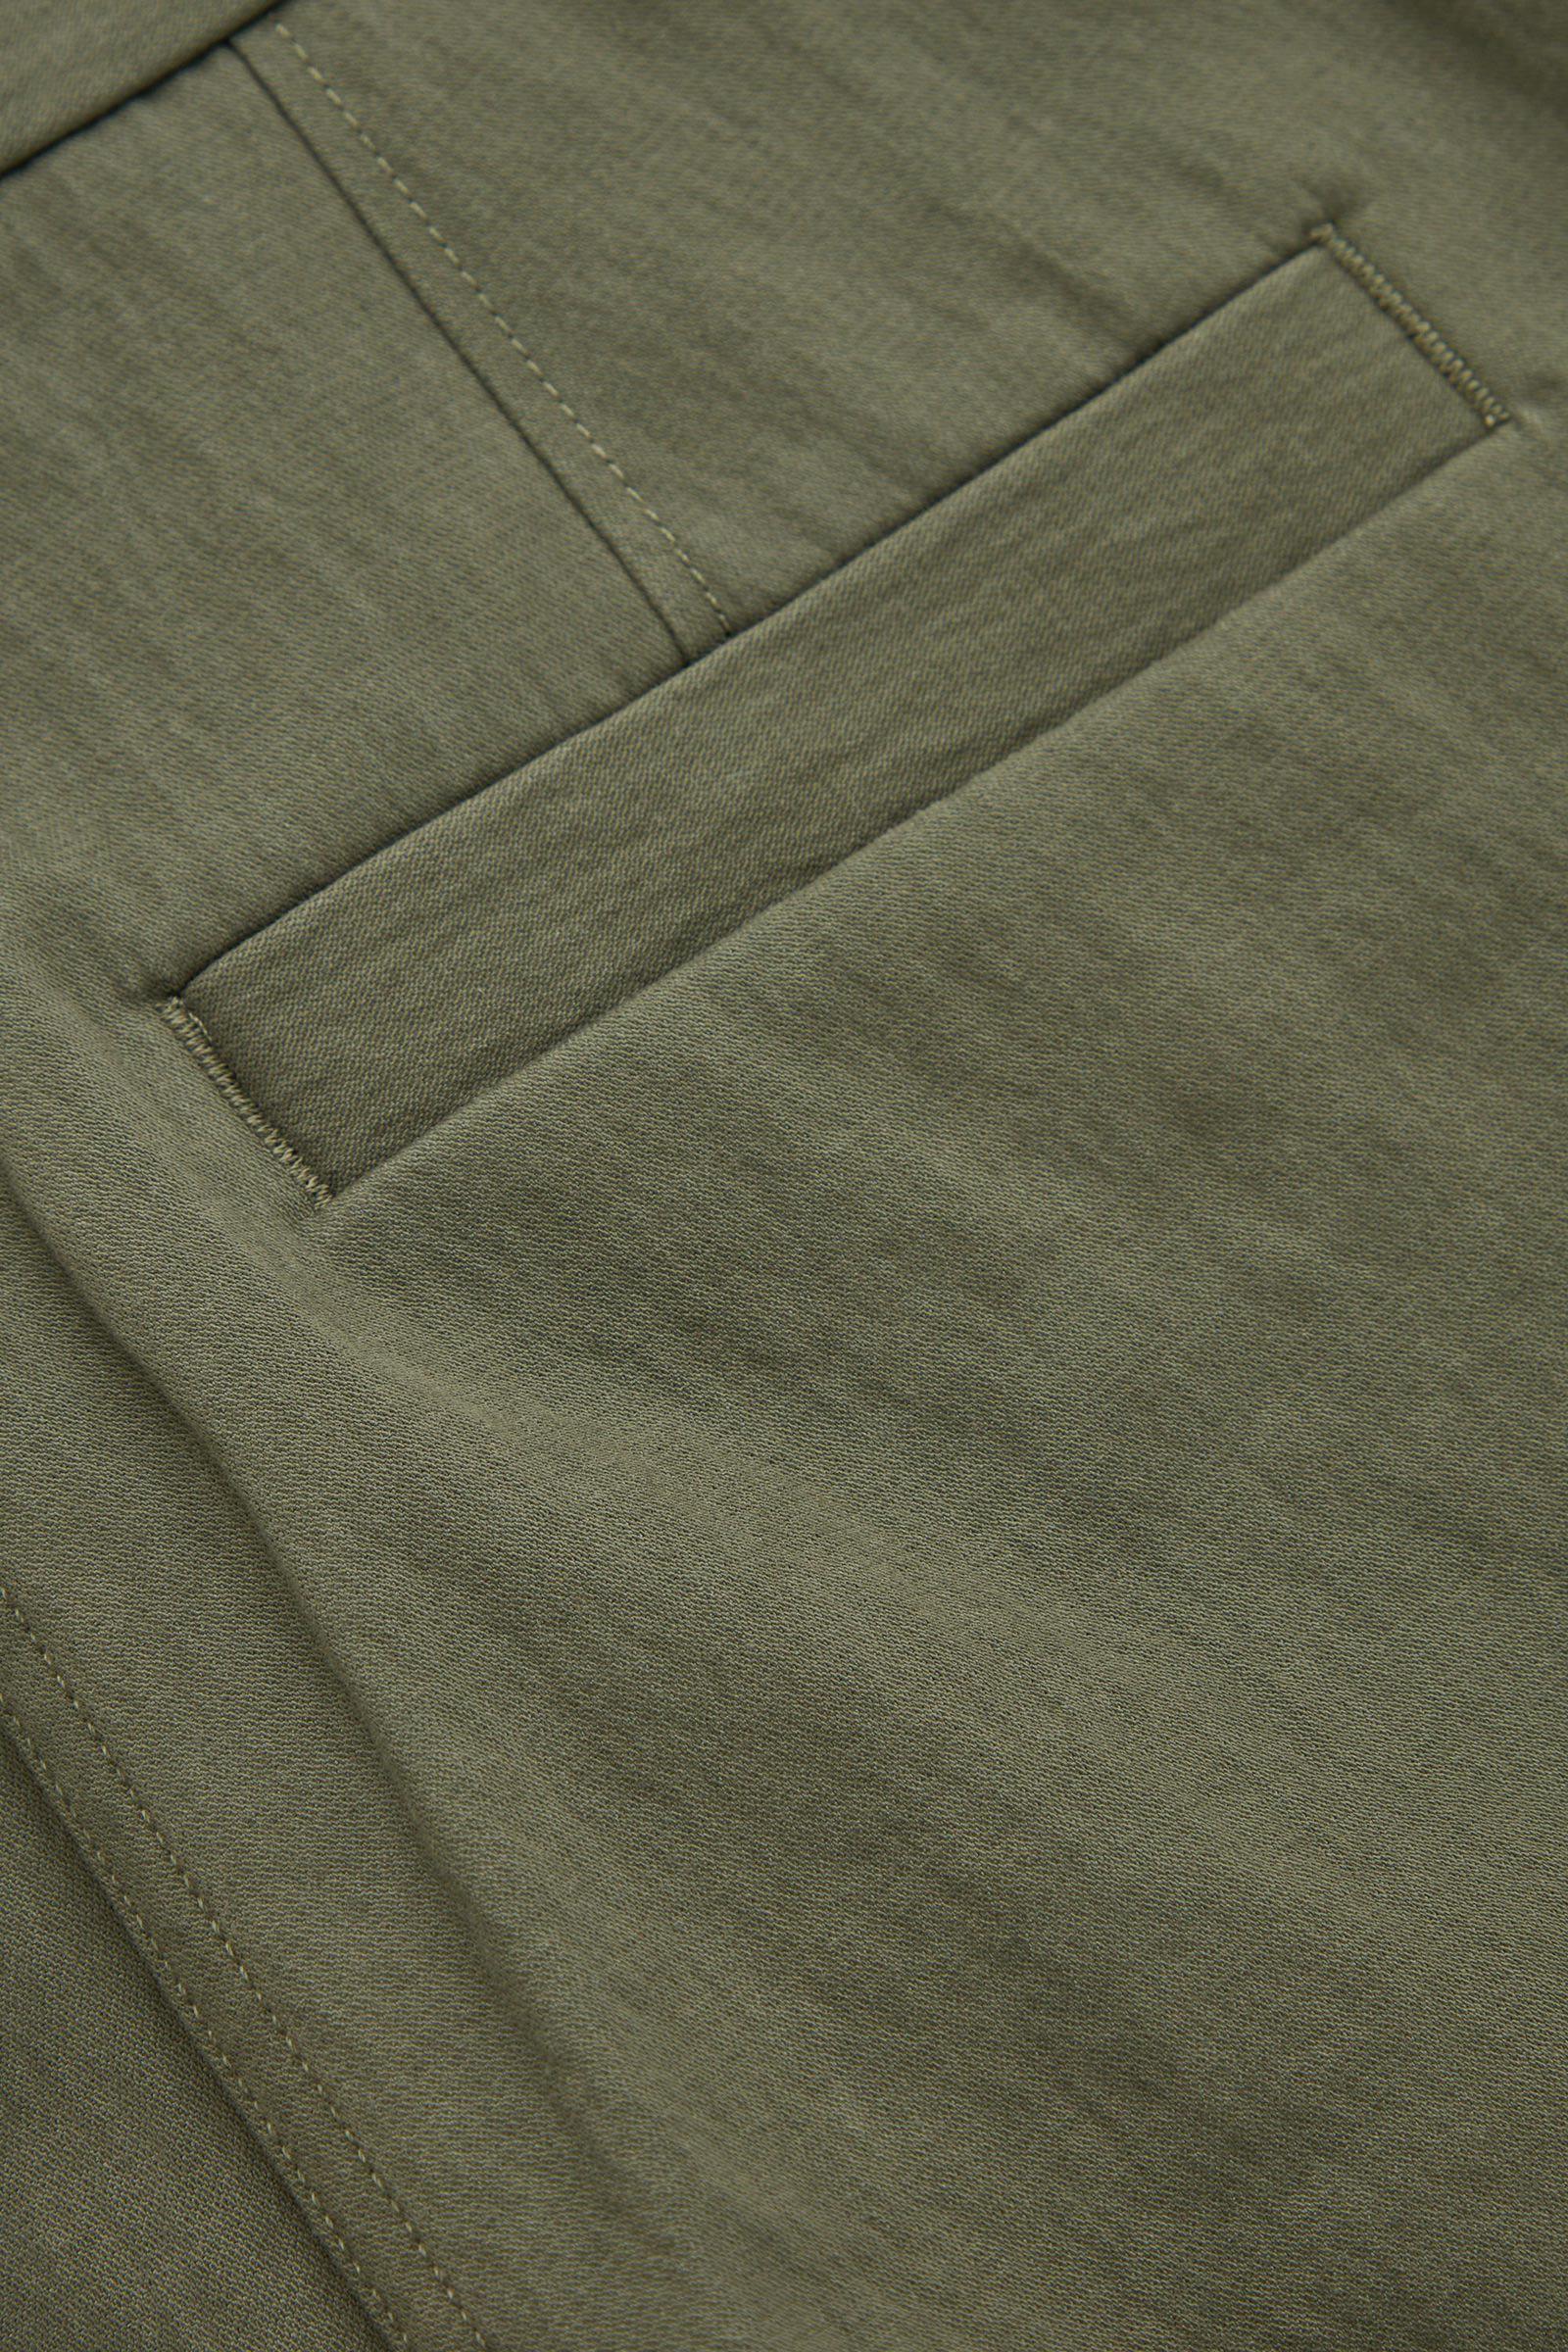 COS 오가닉 코튼 릴랙스드 치노 트라우저의 그린컬러 Detail입니다.